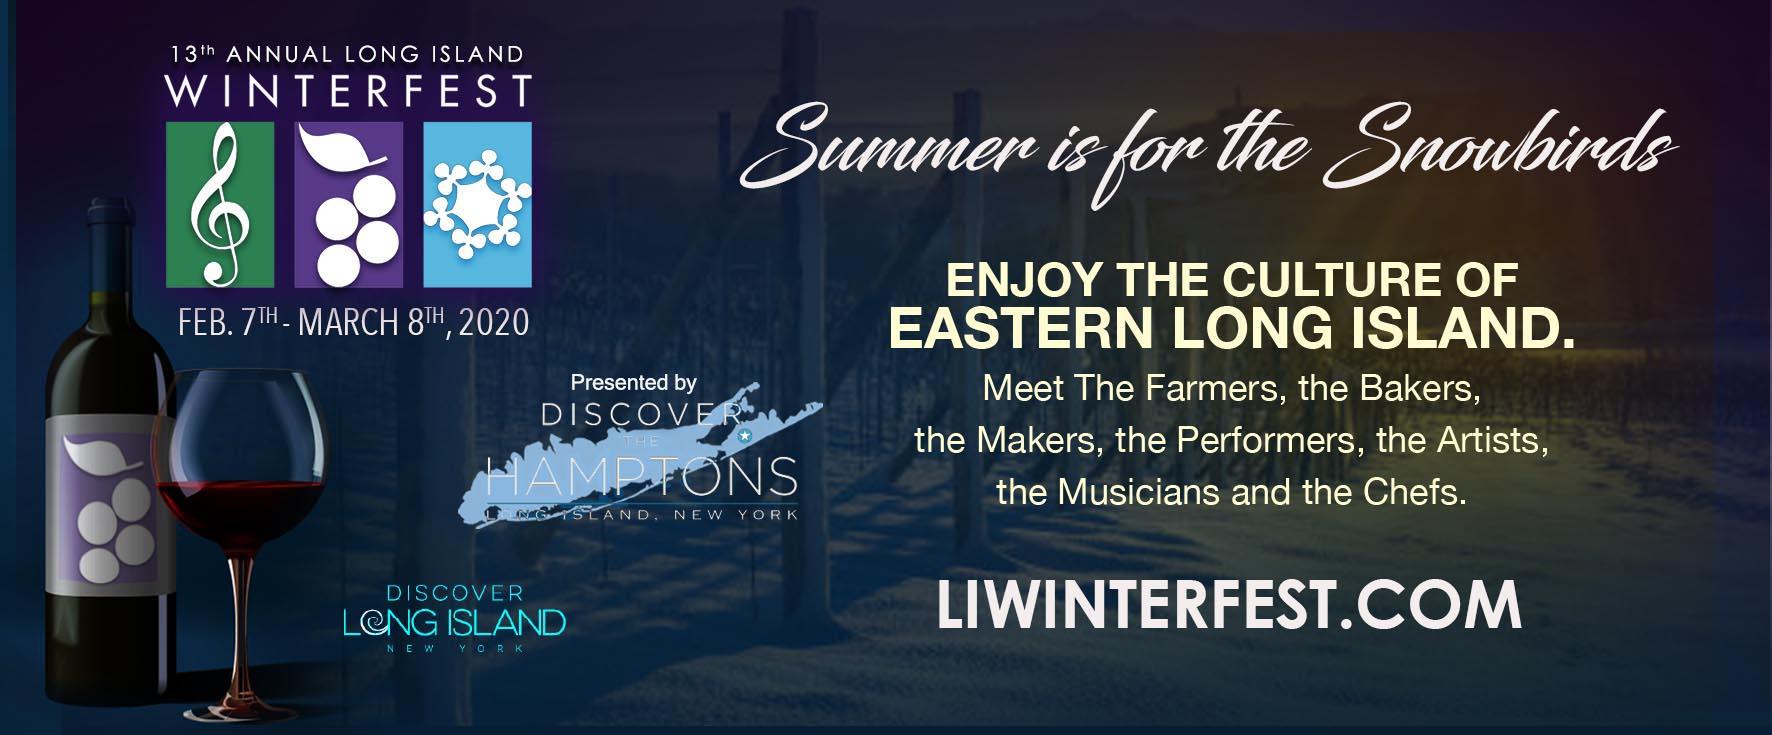 Long Island Street Fairs Fall 2020.Home Long Island Winter Festival